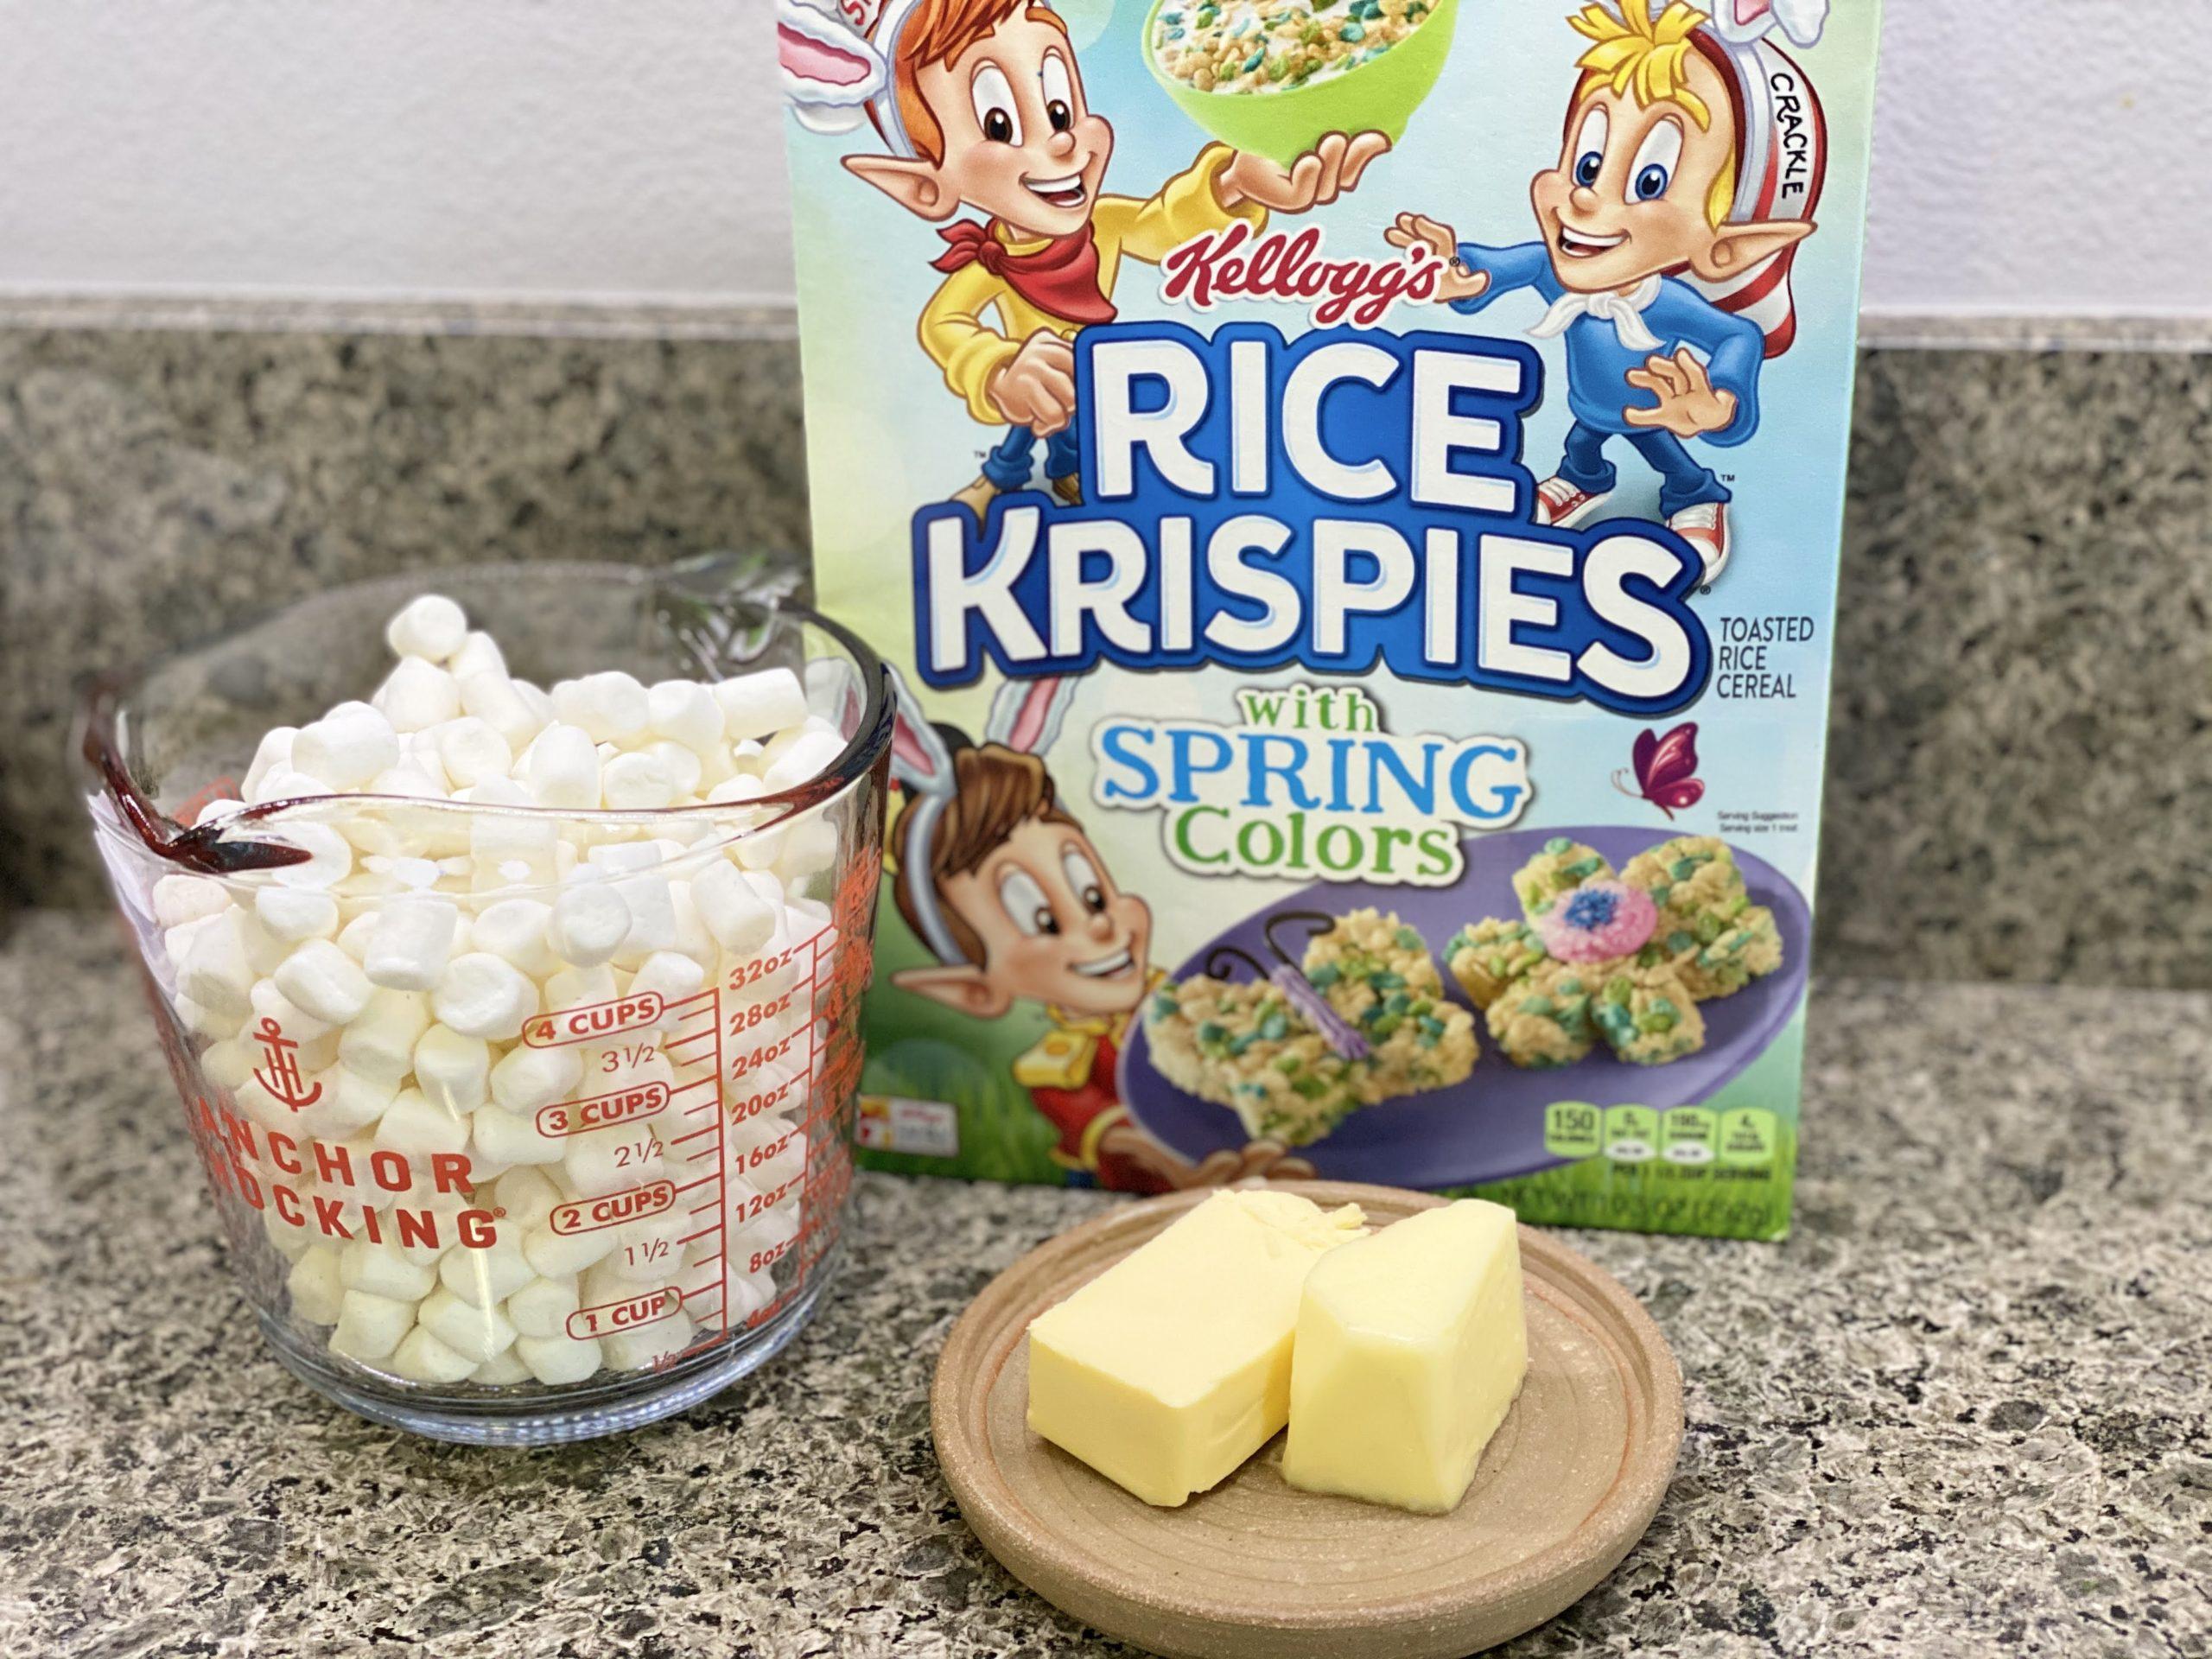 Rice Krispy Treats Ingredients